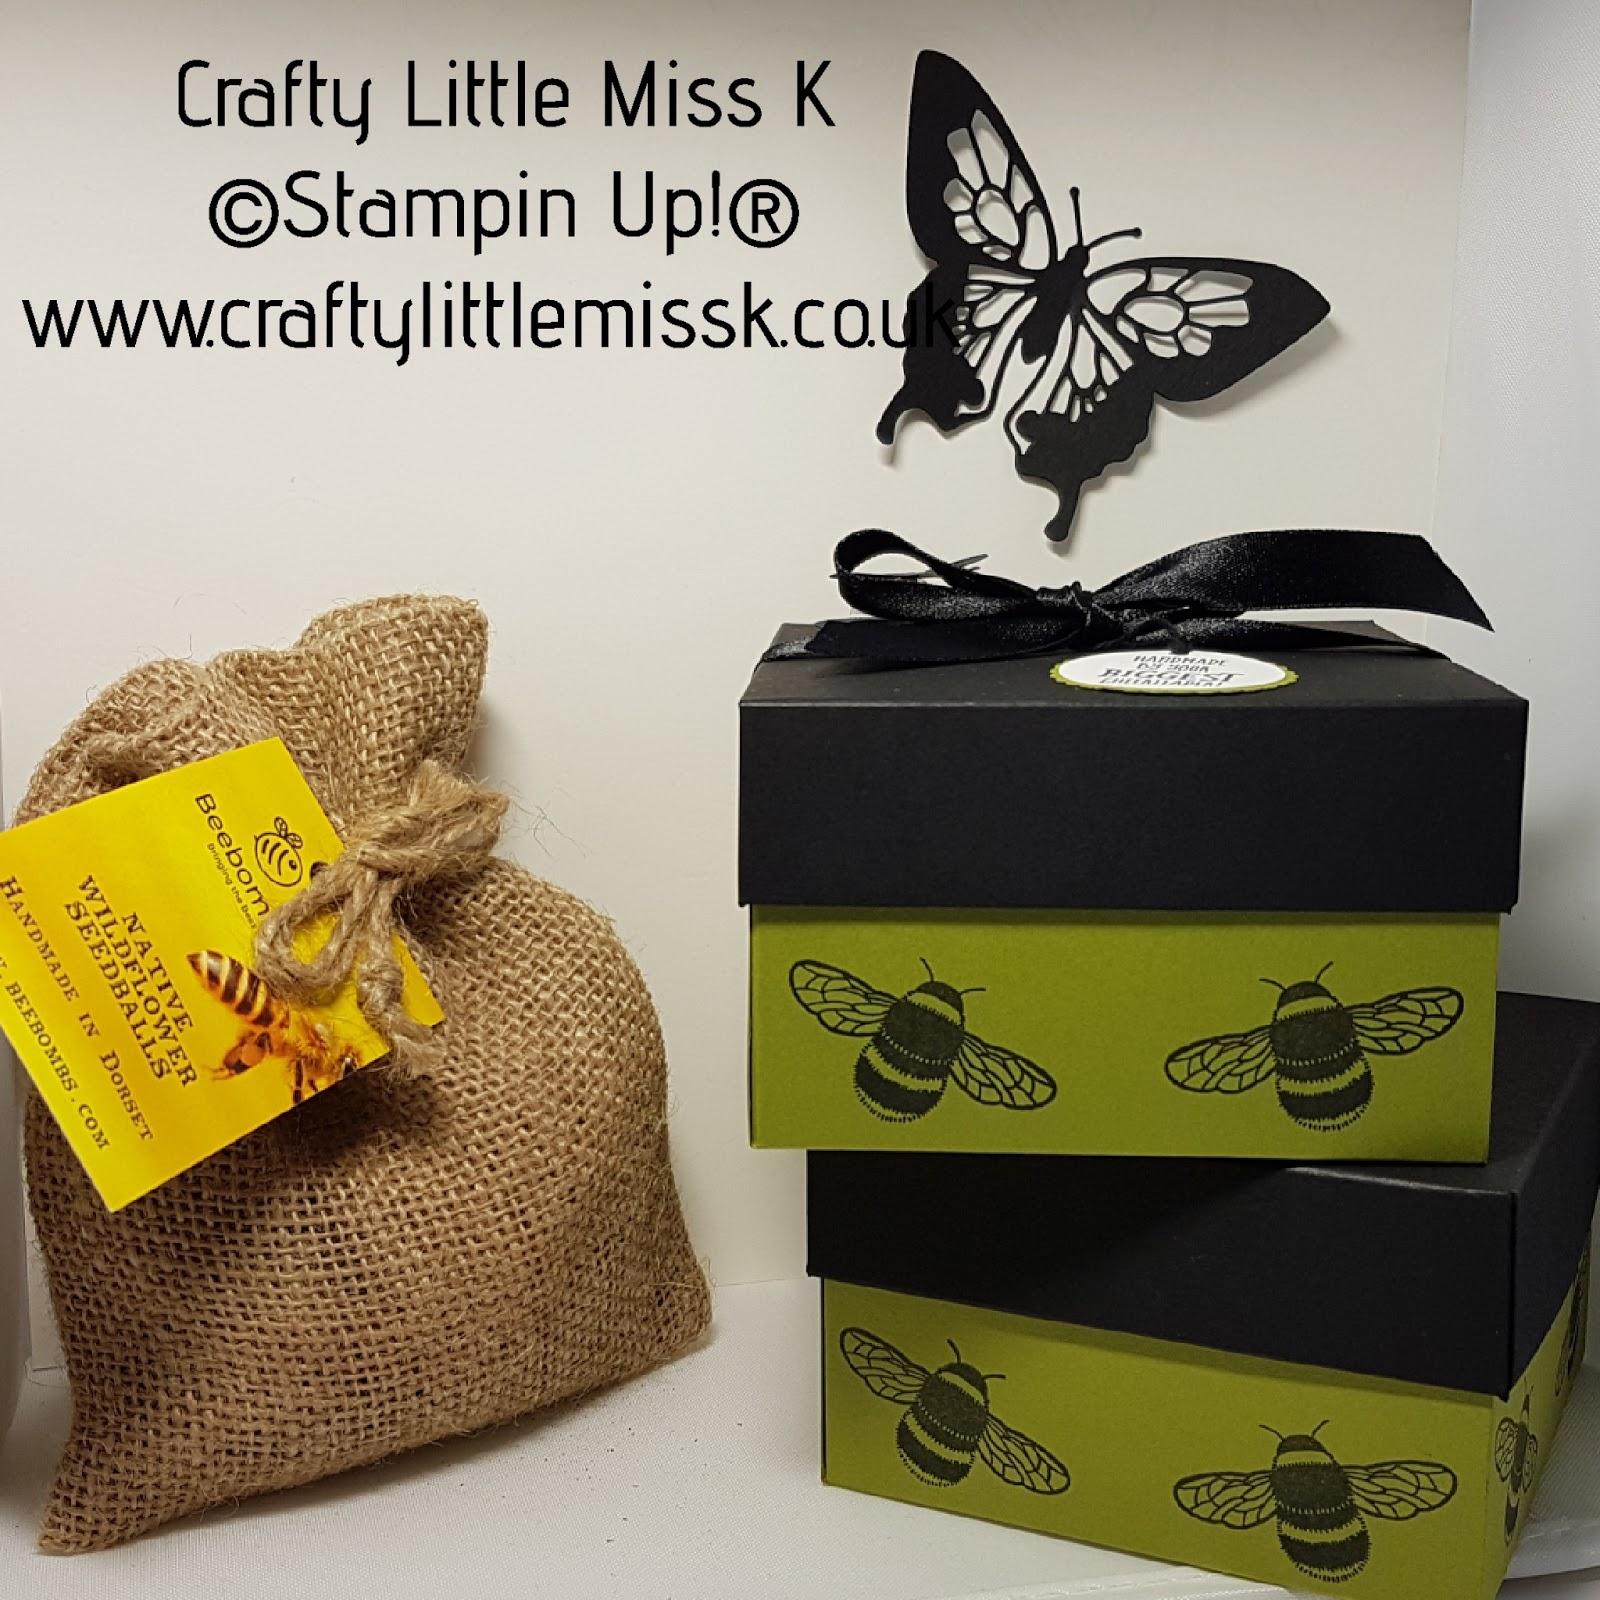 CraftyLittleMissK: Bee Bomb Boxes